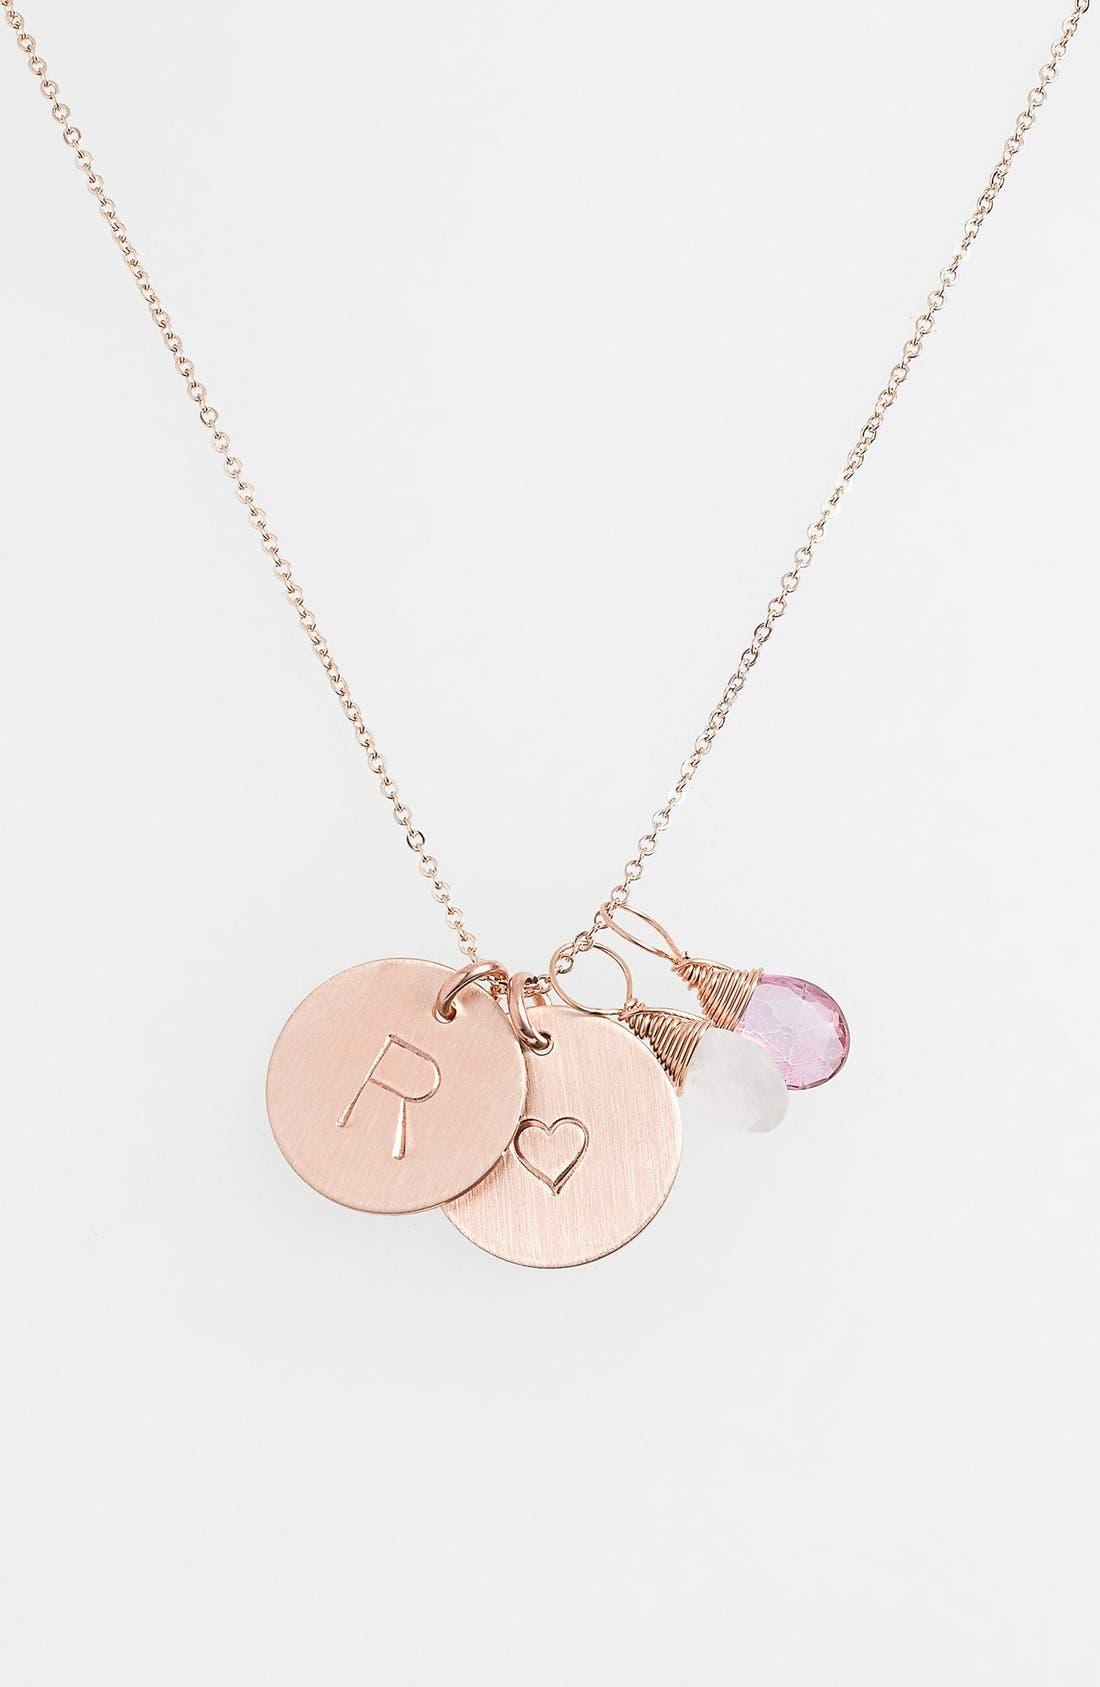 Main Image - Nashelle 14k-Gold Fill Heart Disc, Moonstone & Pink Quartz Initial Necklace